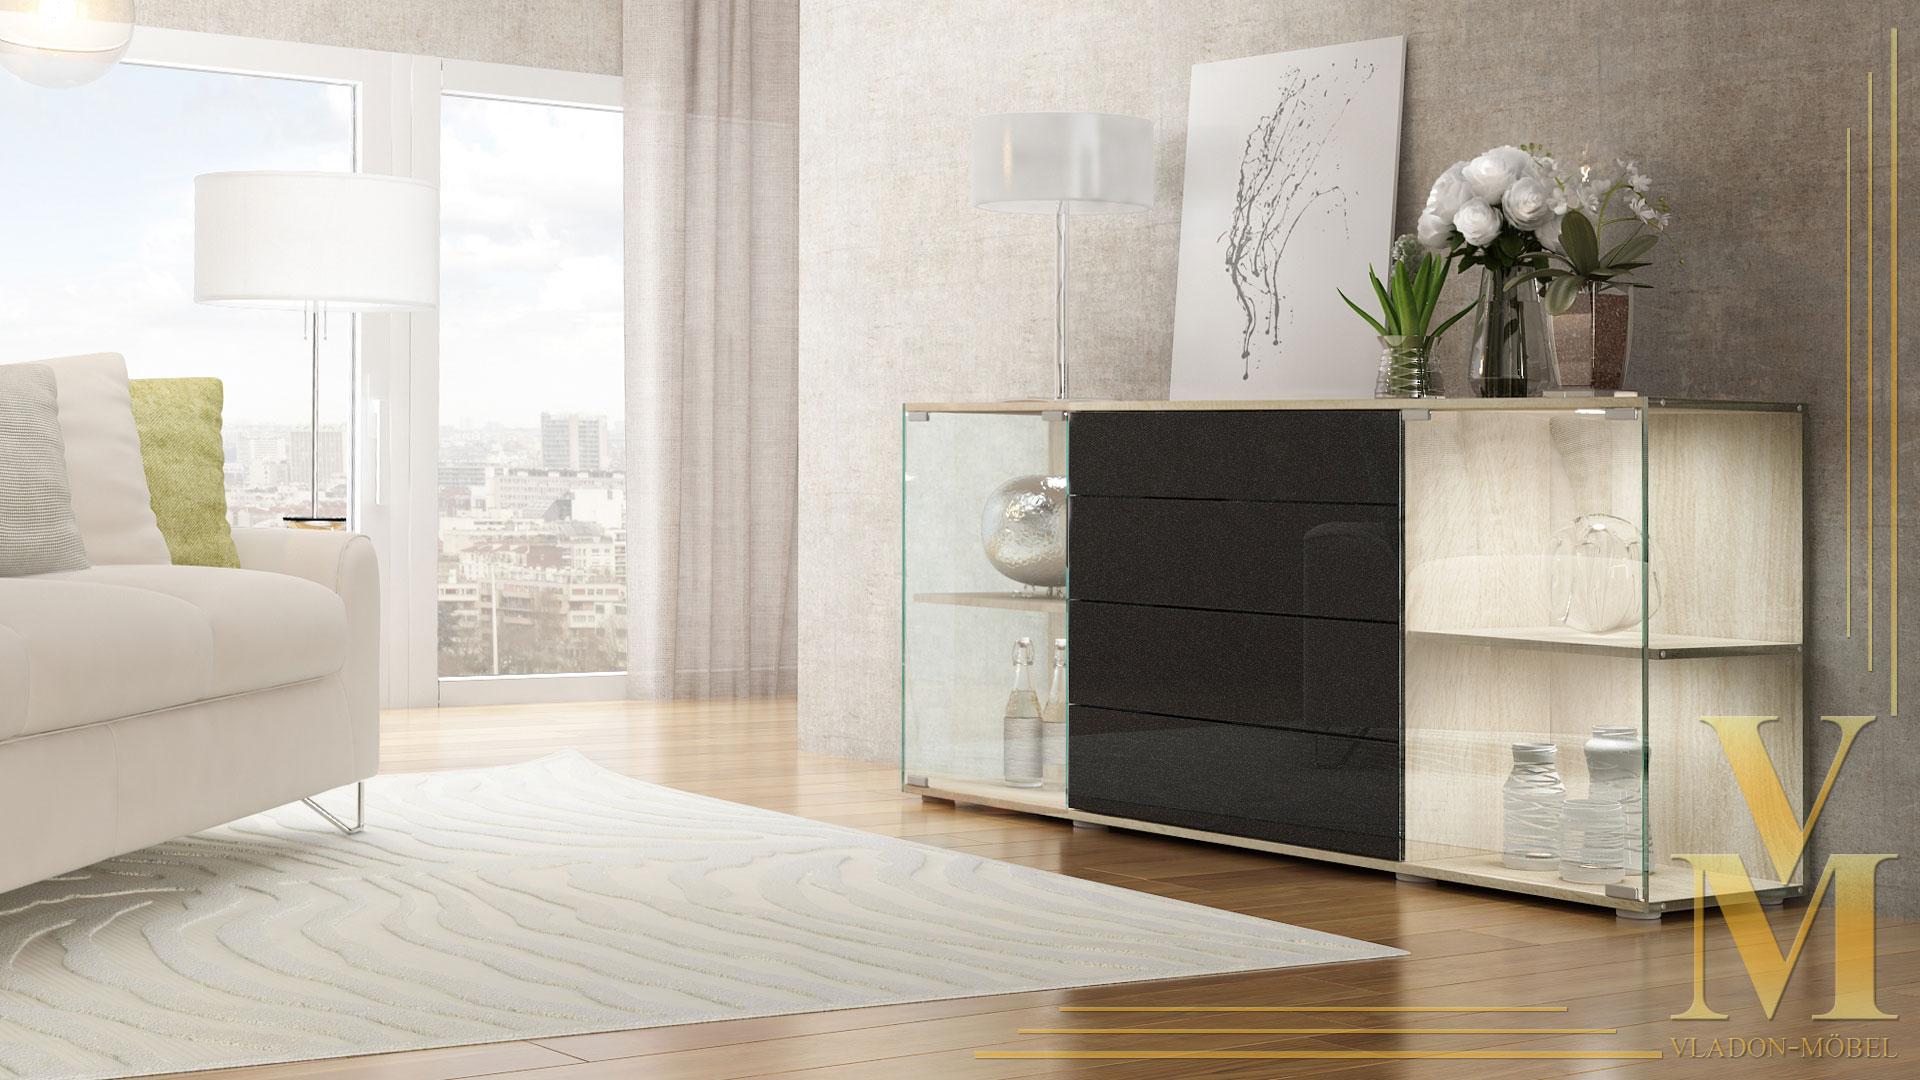 sideboard kommode vitrine anrichte f hr v2 eiche s gerau hochglanz naturt ne ebay. Black Bedroom Furniture Sets. Home Design Ideas